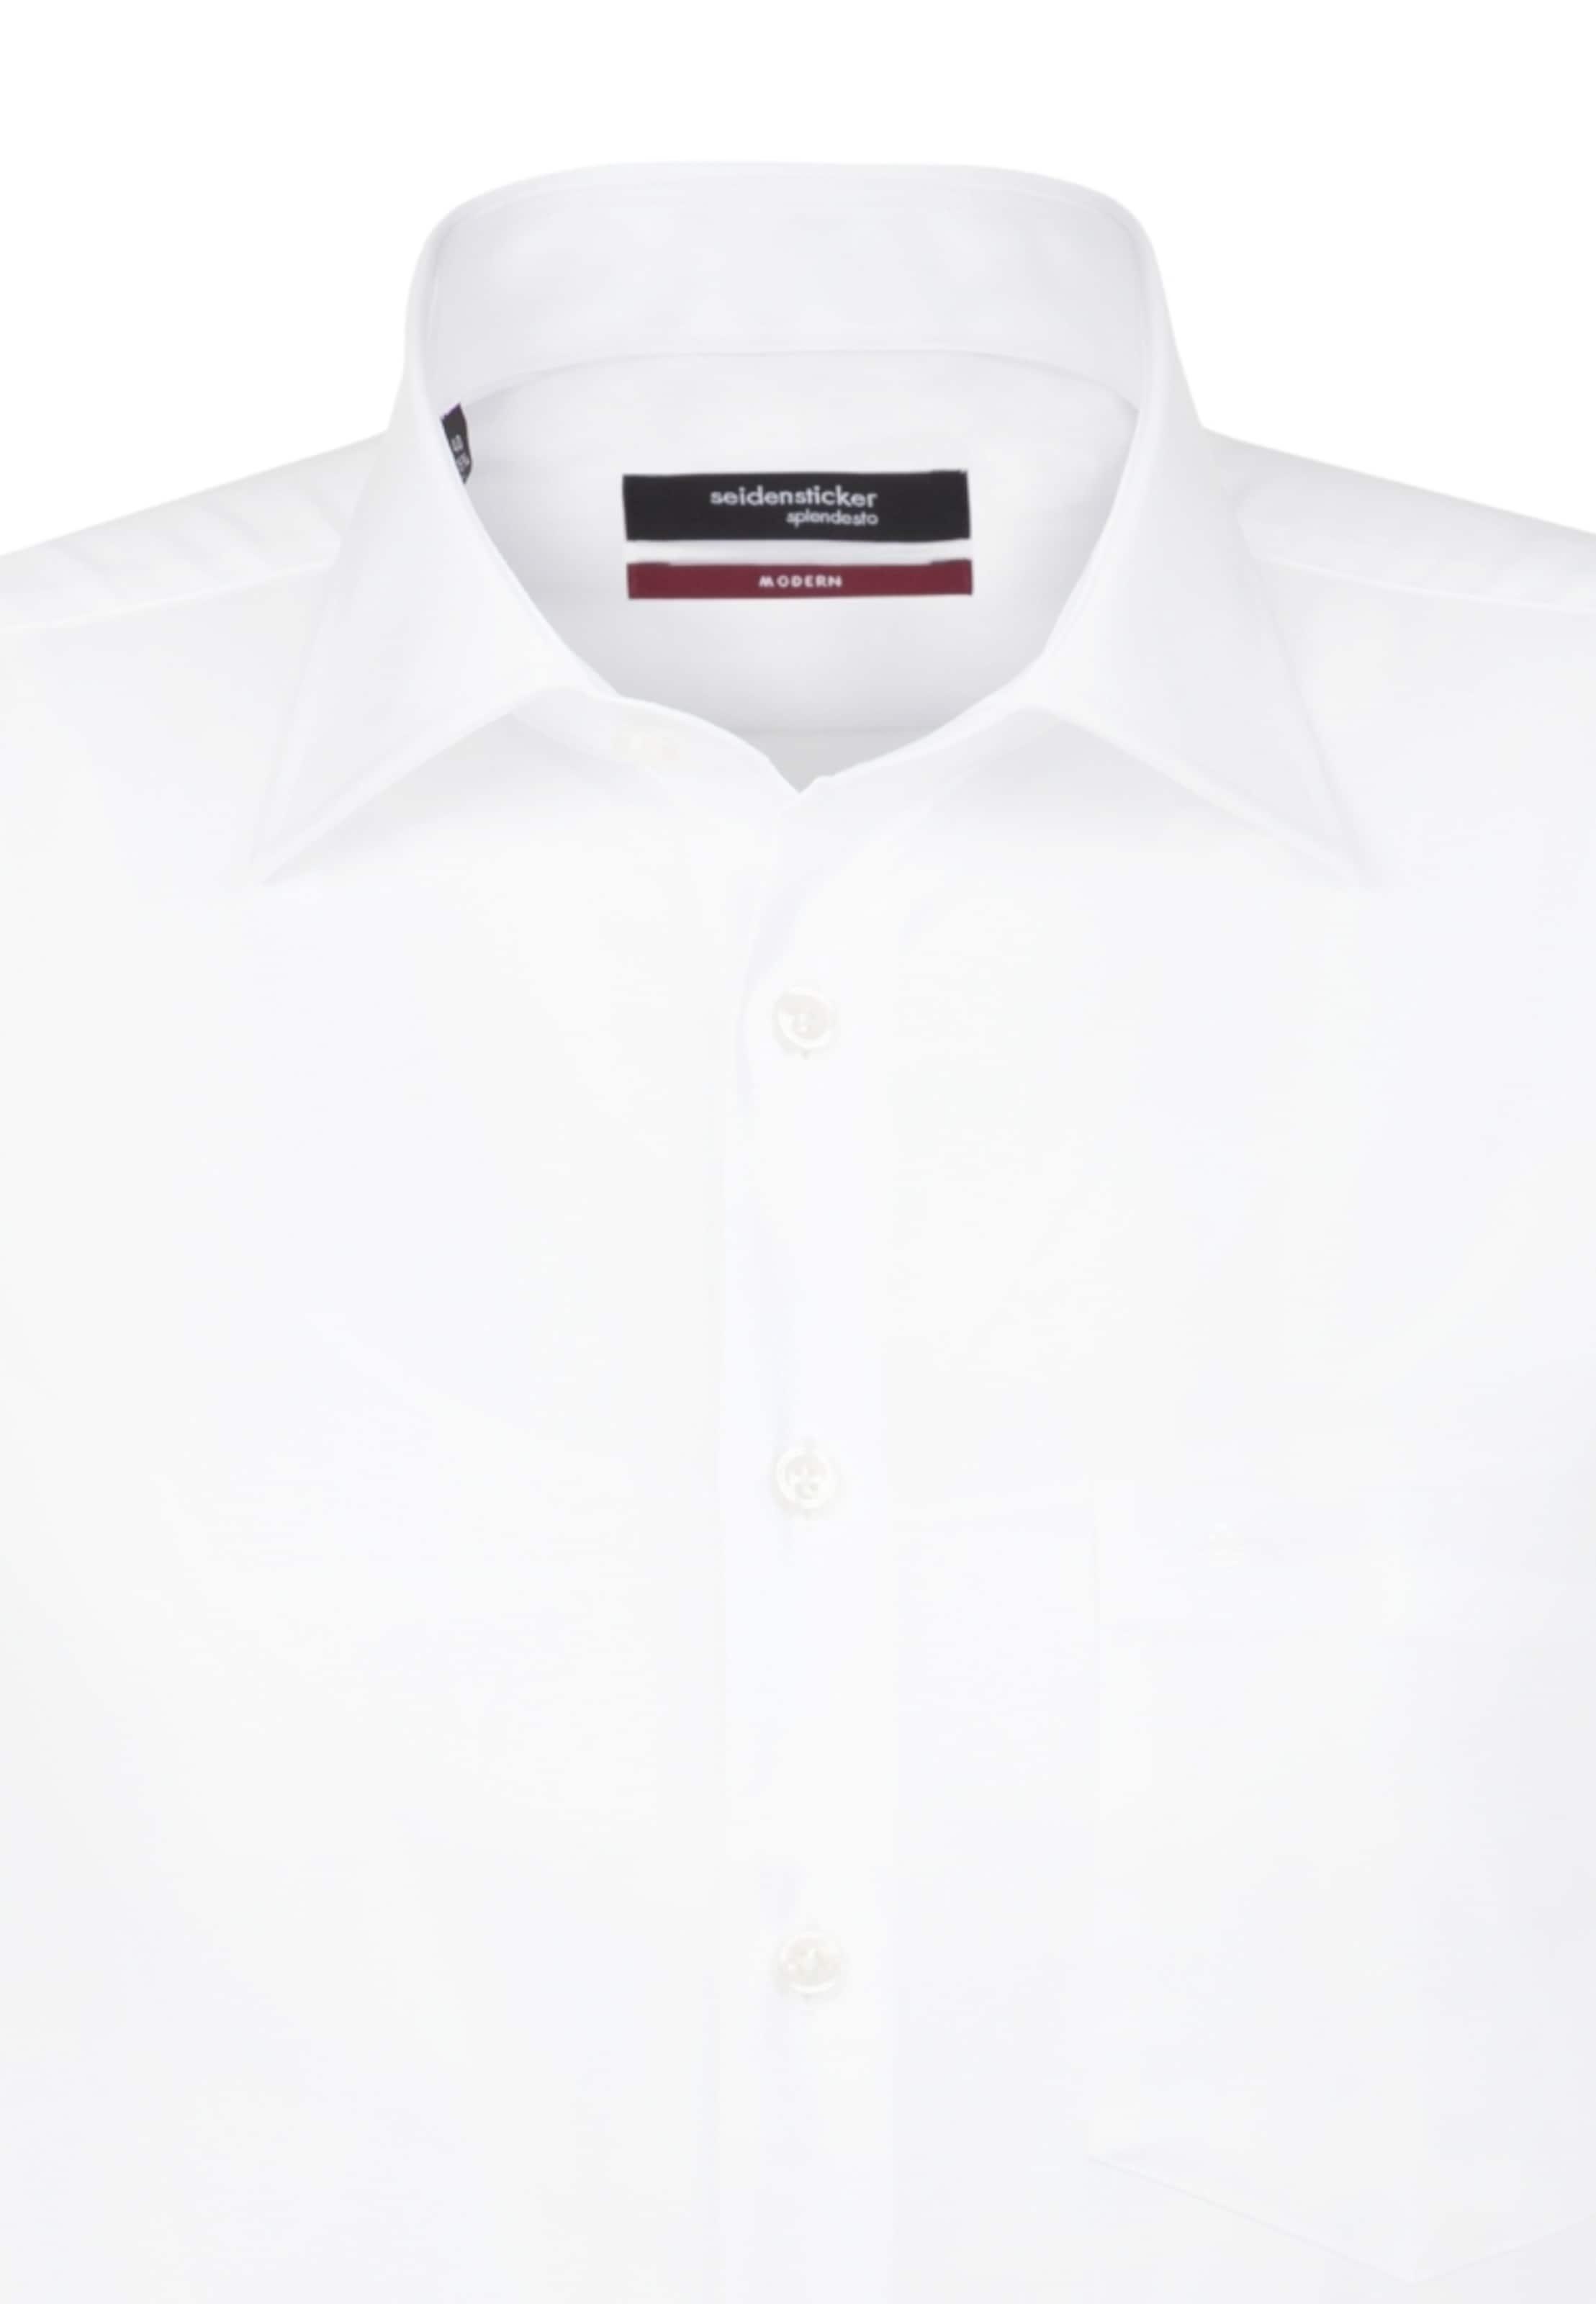 Seidensticker En Business Modern Chemise Blanc ' QrstdxhC